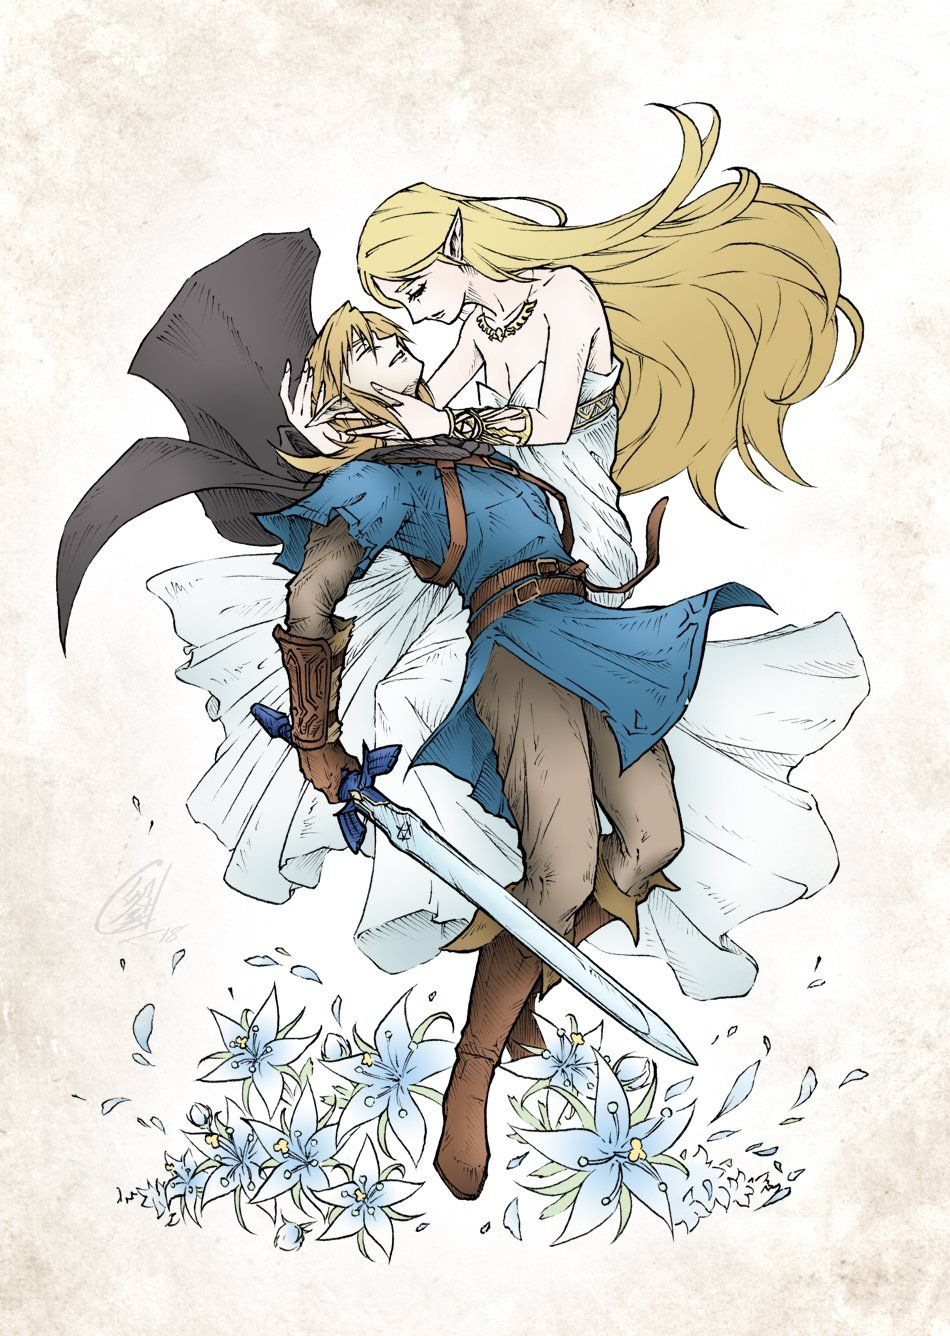 Art Of Onichild On Jeux Videos Pinterest Zelda La Legende De